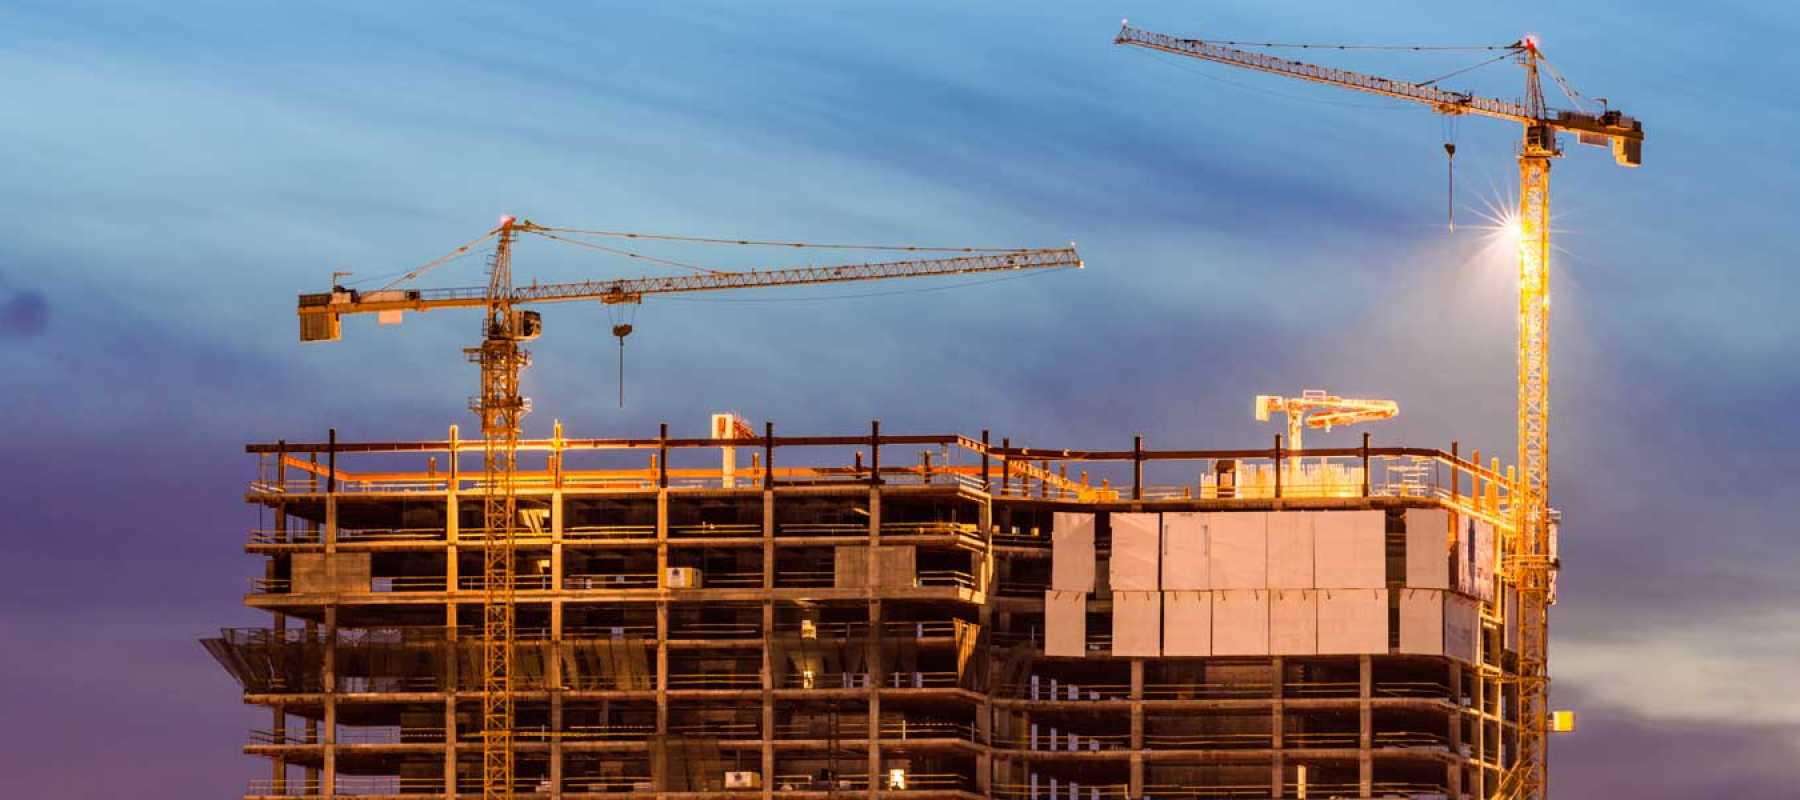 Adhesives & construction